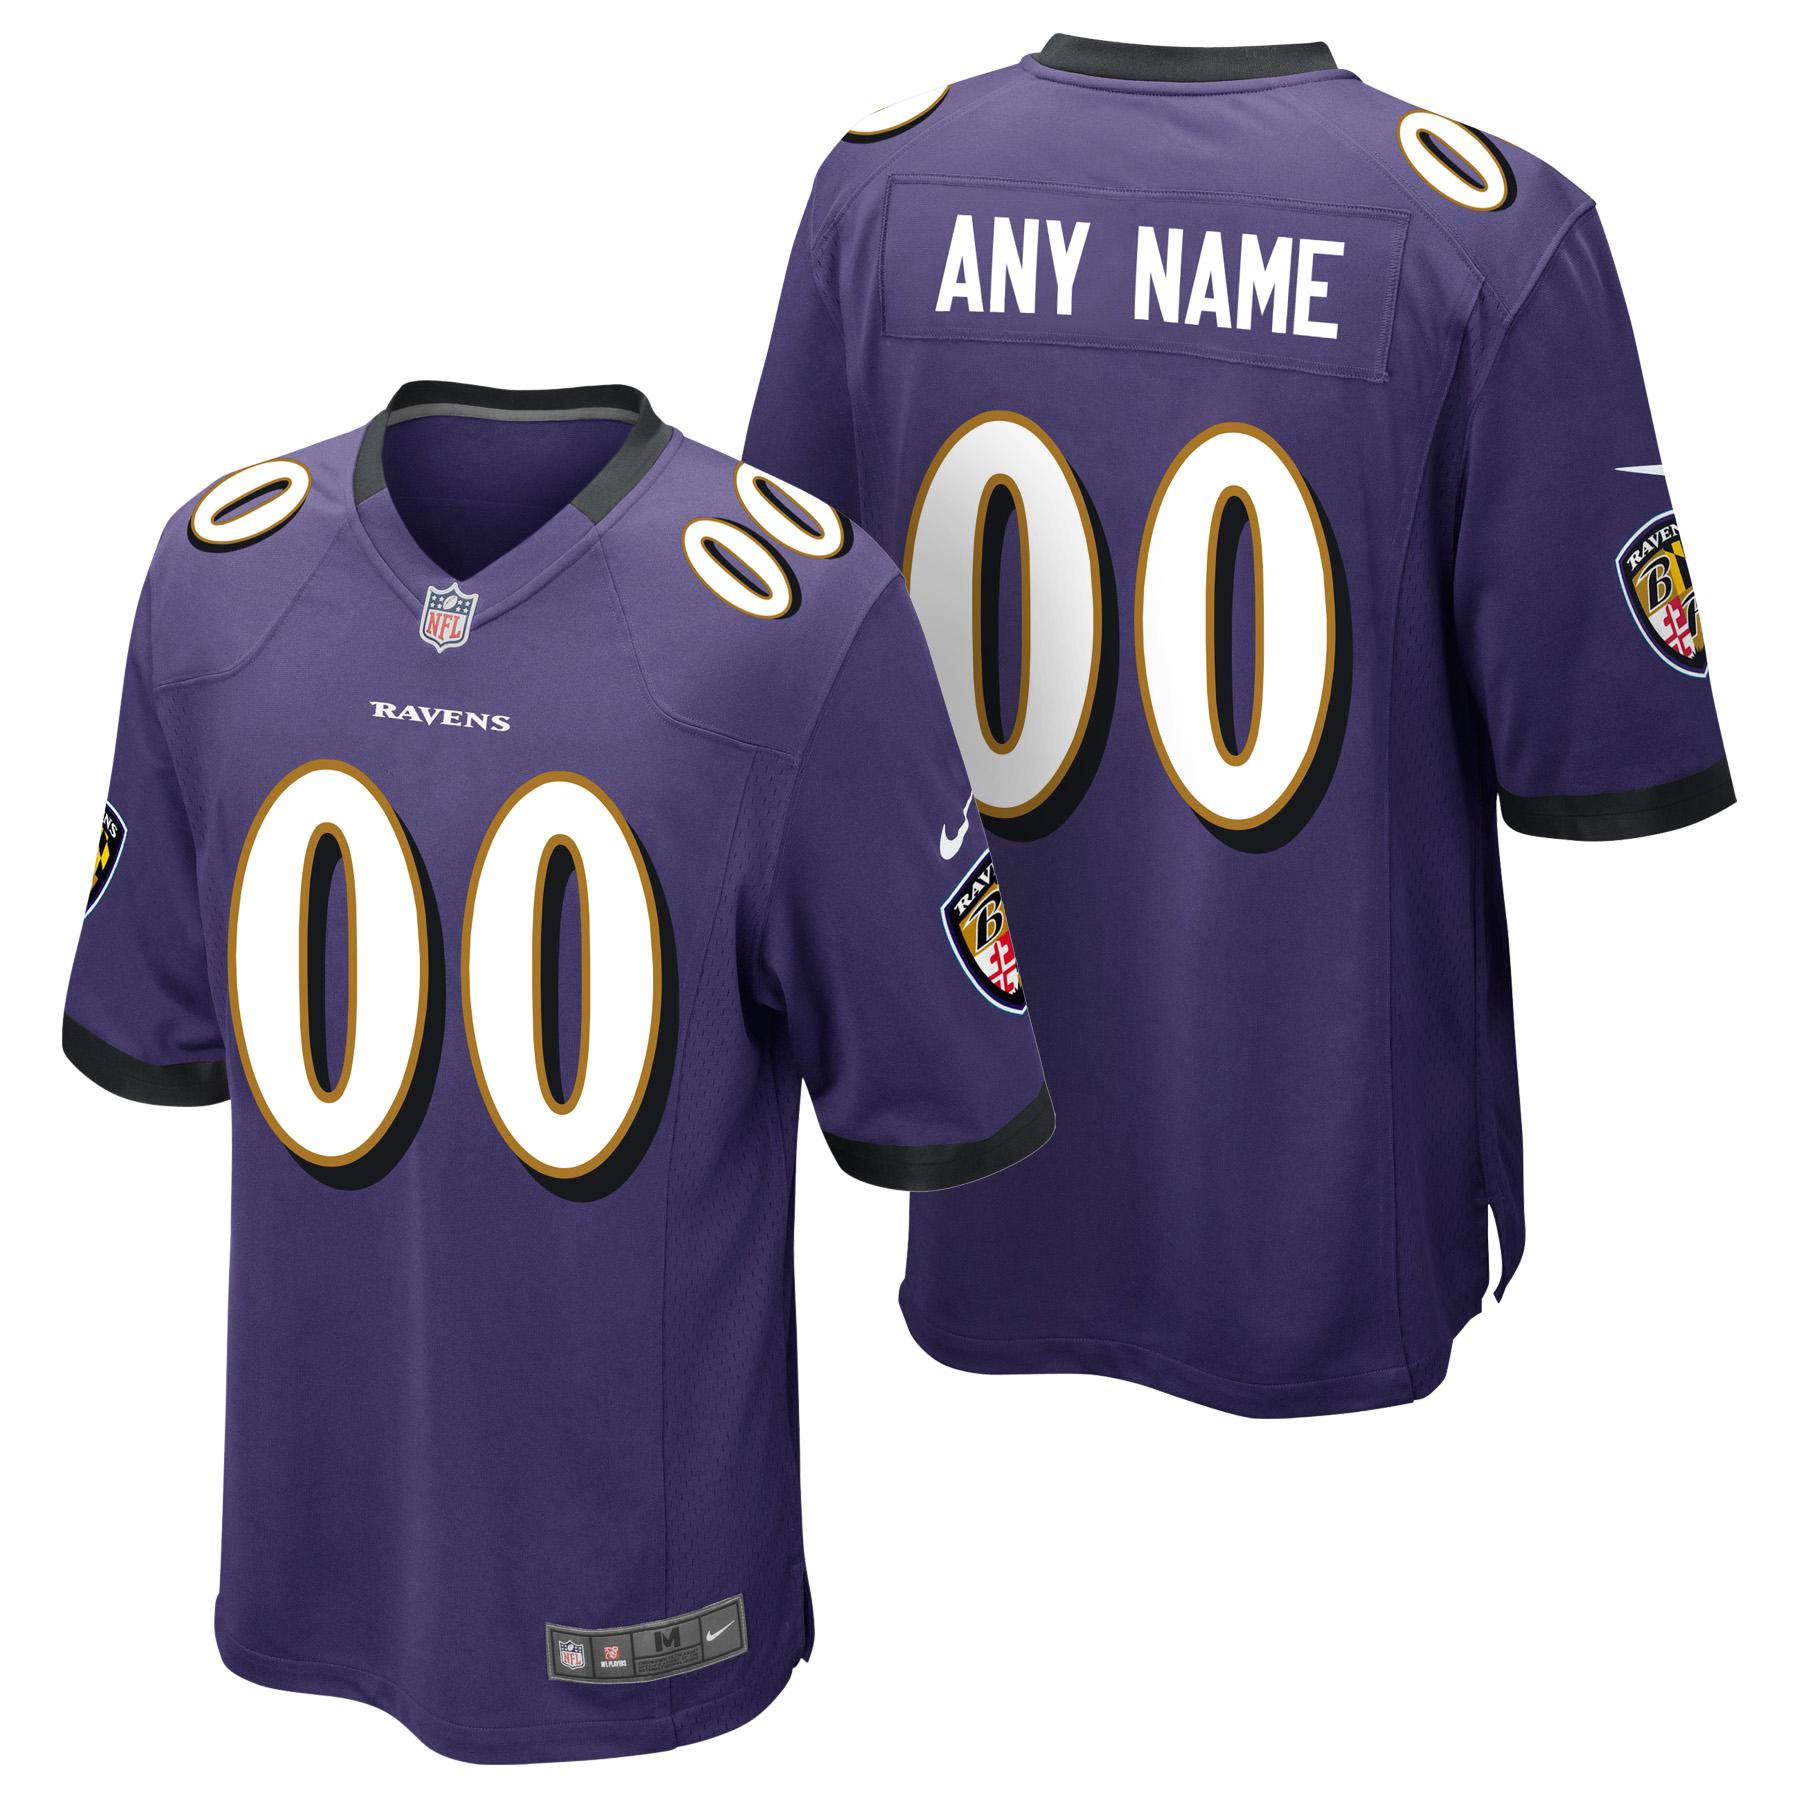 Baltimore Ravens Heimspieltrikot - maßgeschneidert - Jugendliche